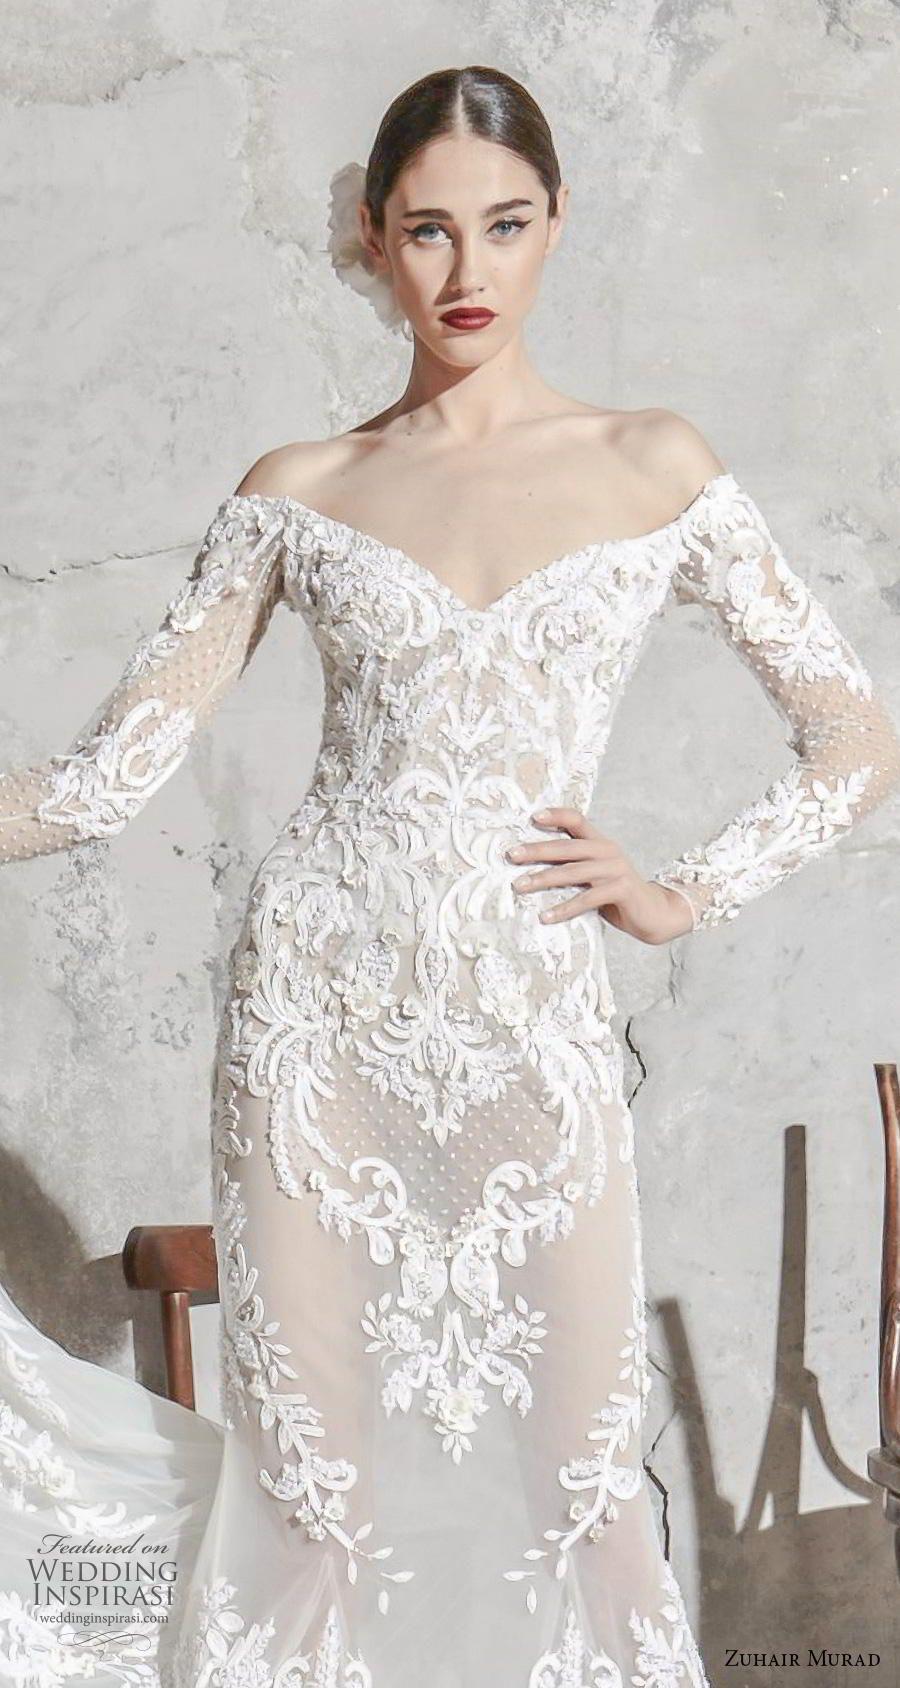 Zuhair Murad Spring 2020 Wedding Dresses Wedding Inspirasi Wedding Dresses Bridal Gown Inspiration Backless Wedding Dress [ jpg ]